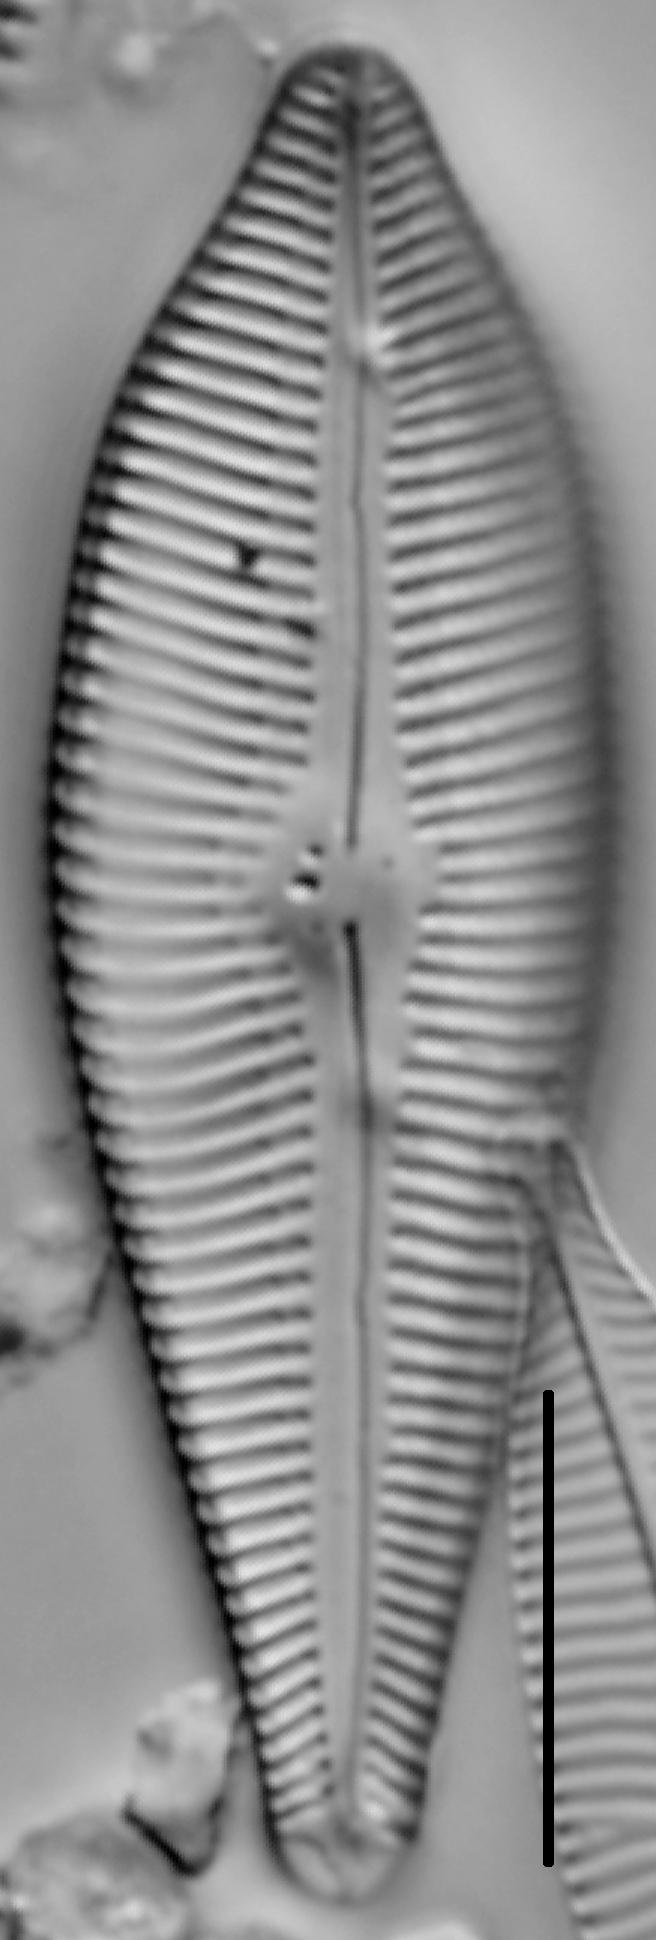 Gomphoneis eriense var. apiculata LM3